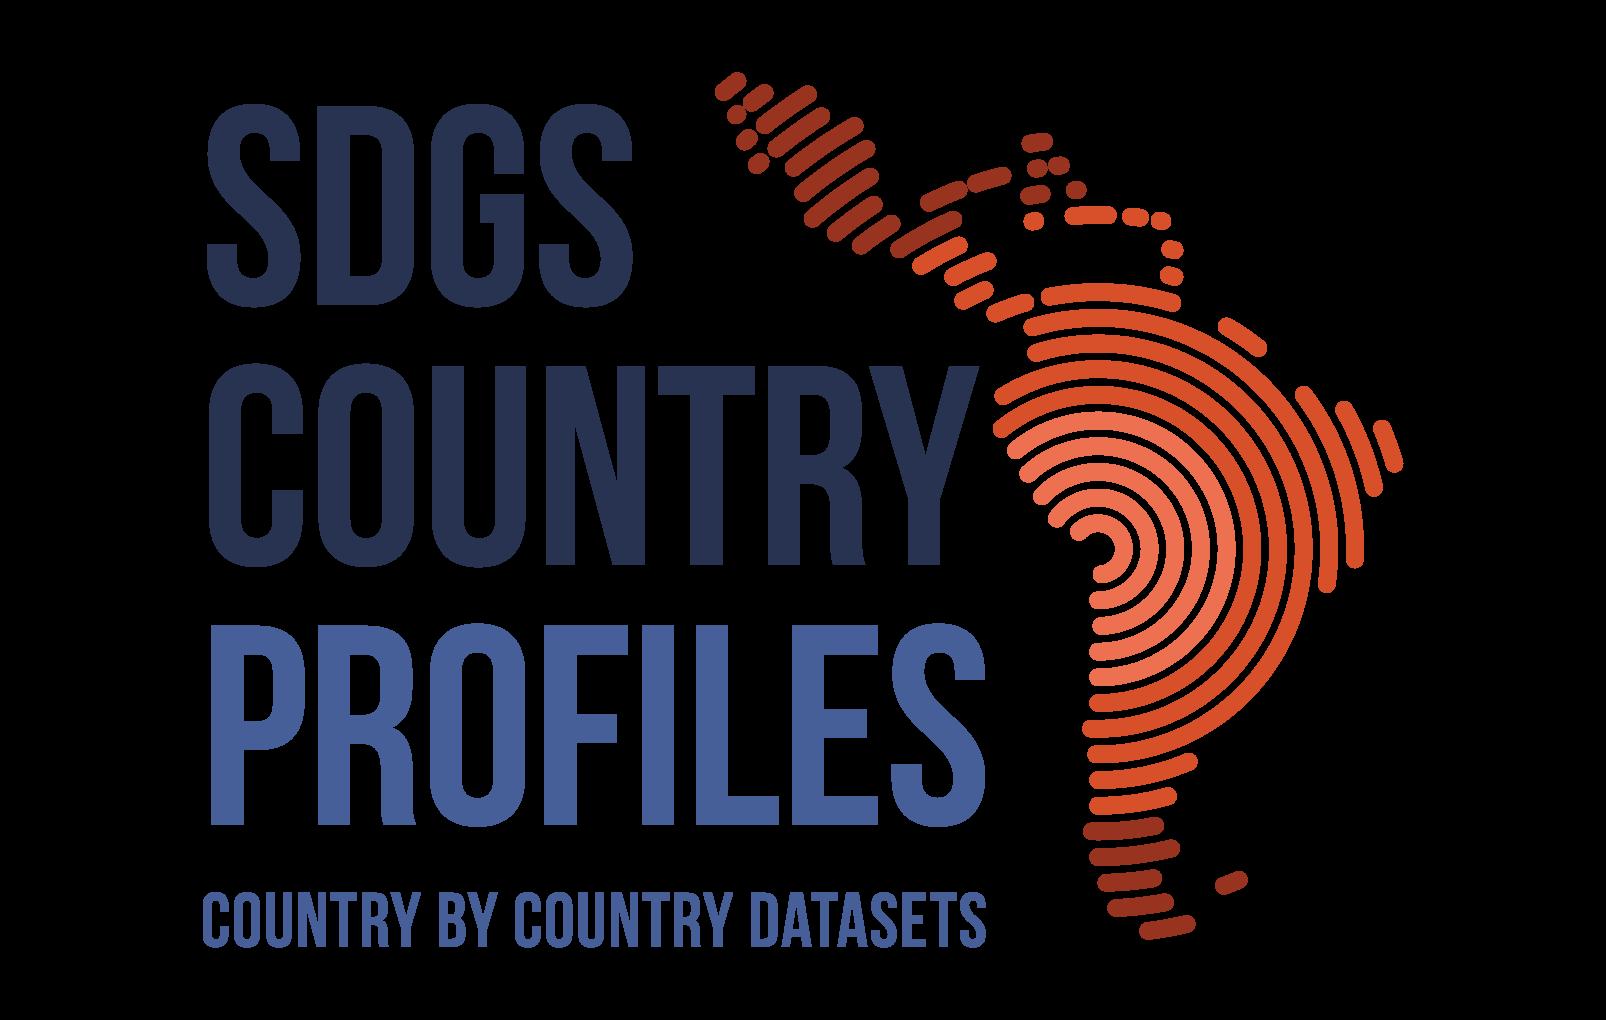 SDGs Country Profiles